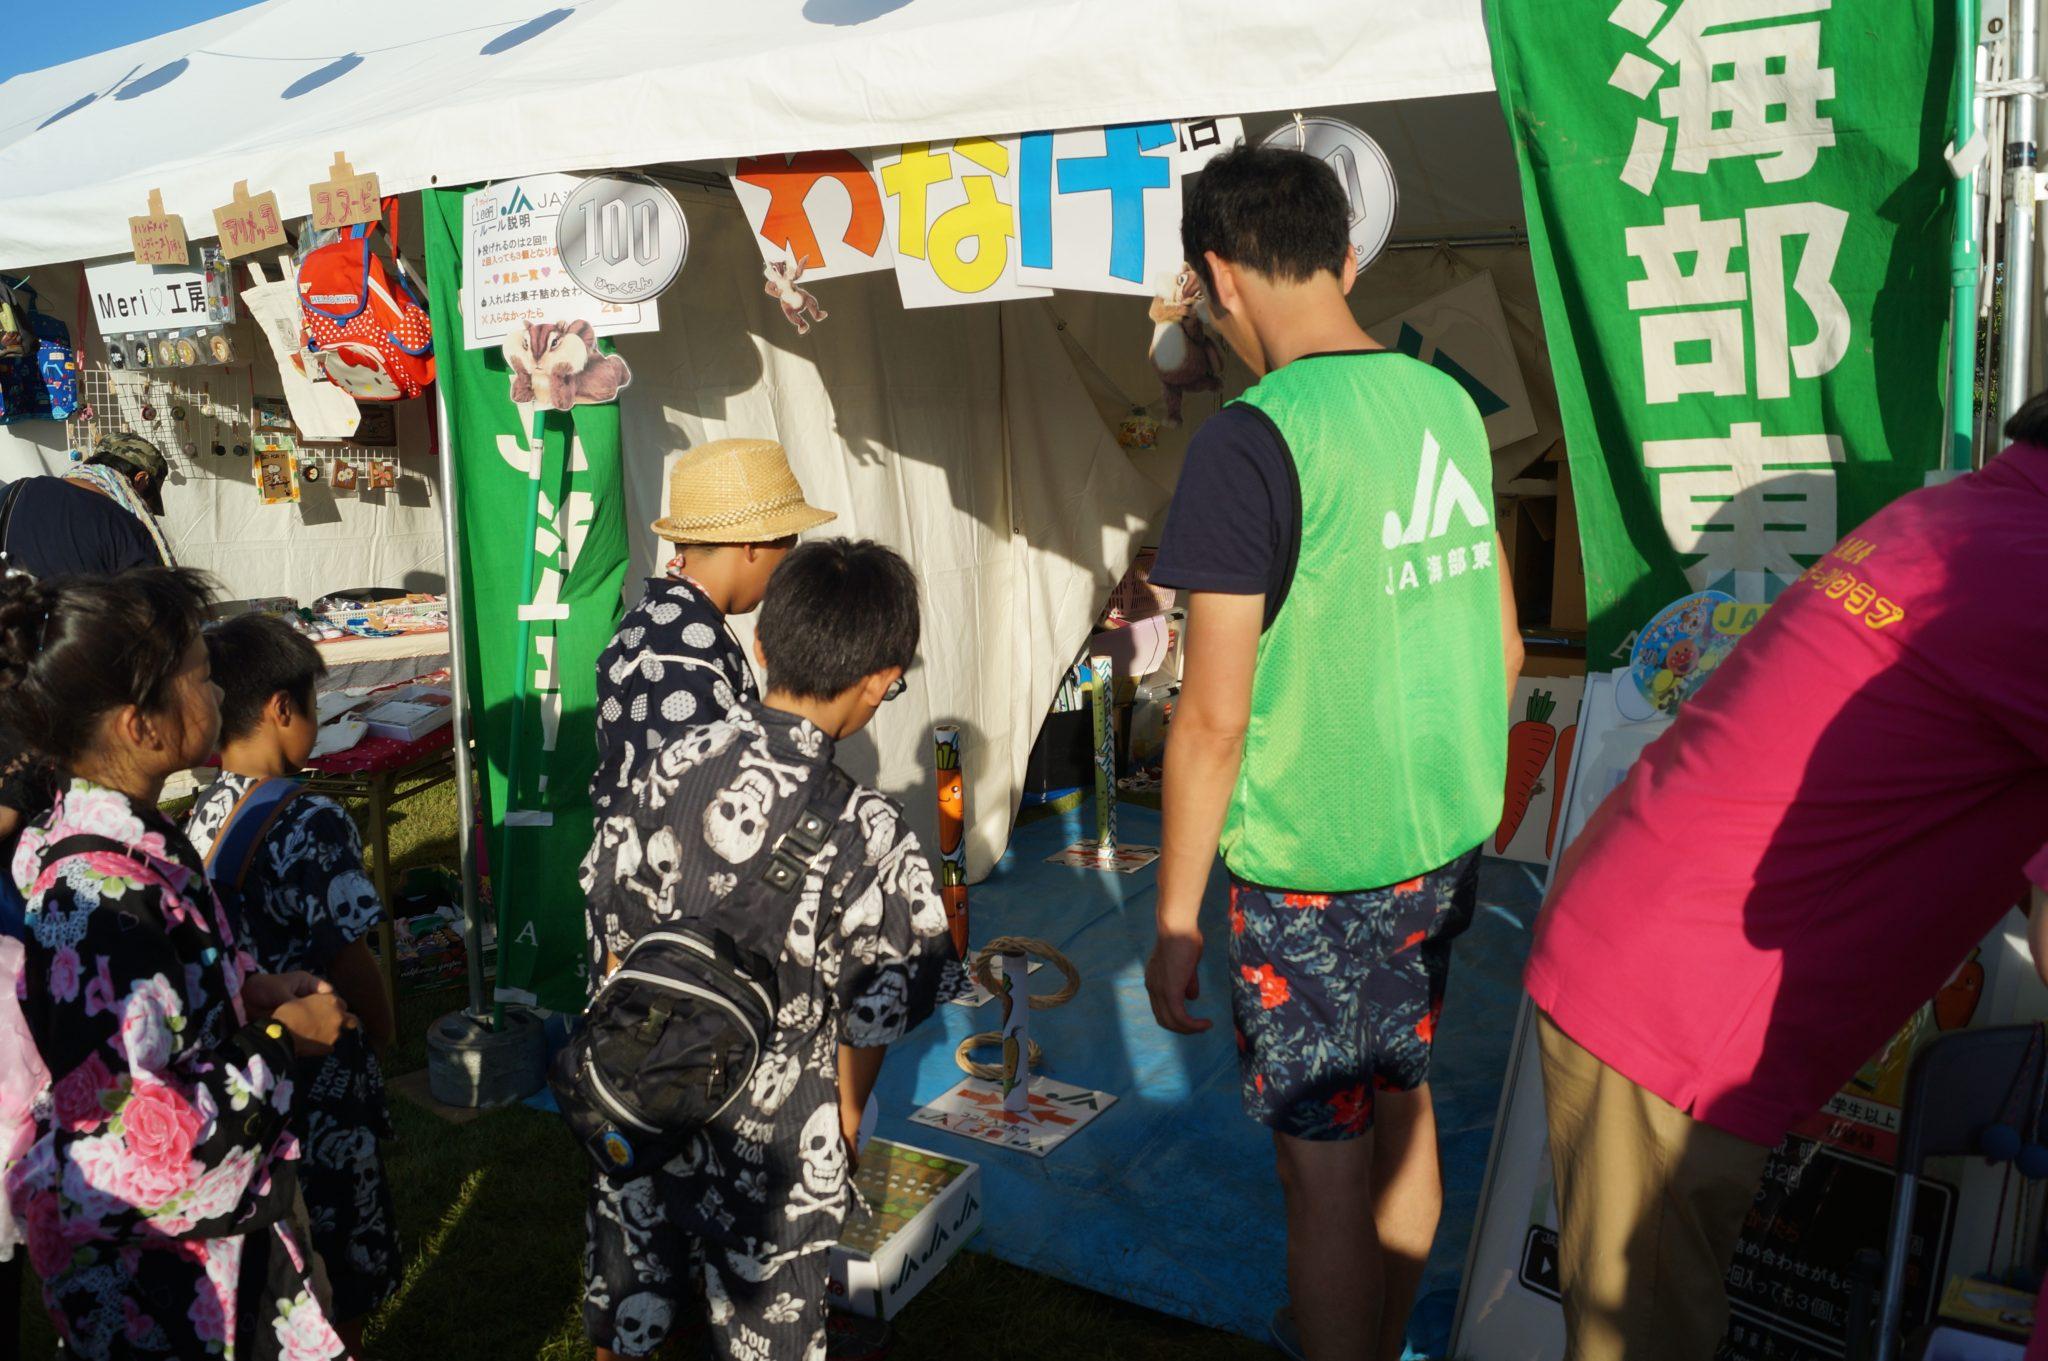 JA 海部東農業協同組合(あまひがし) -夏祭りを盛り上げよう